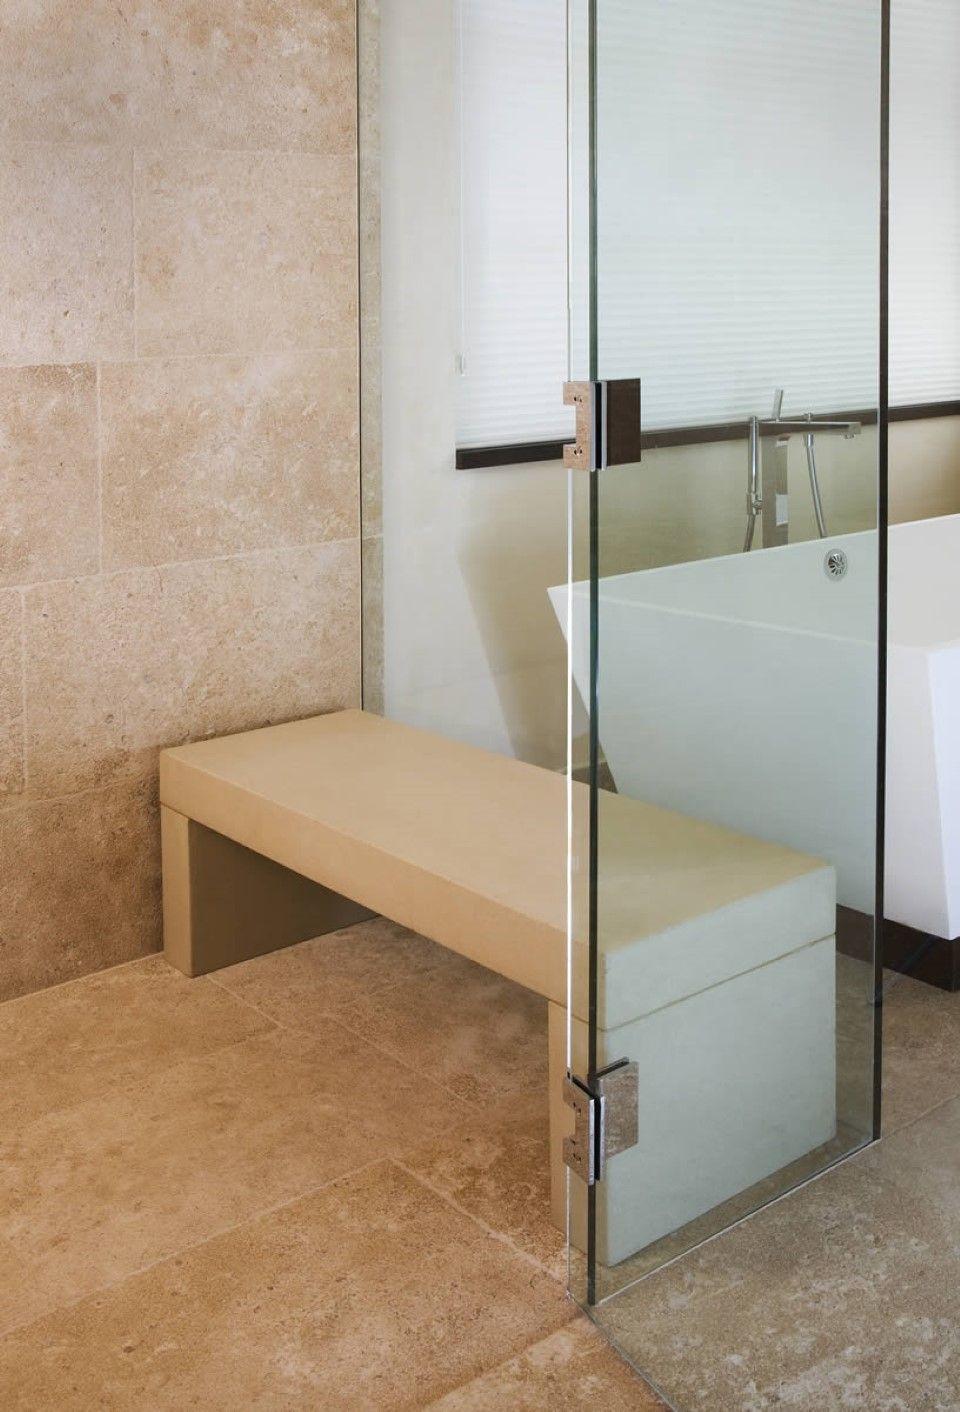 Brown Bathroom Tile Design Idea feat Contemporary Shower Bench